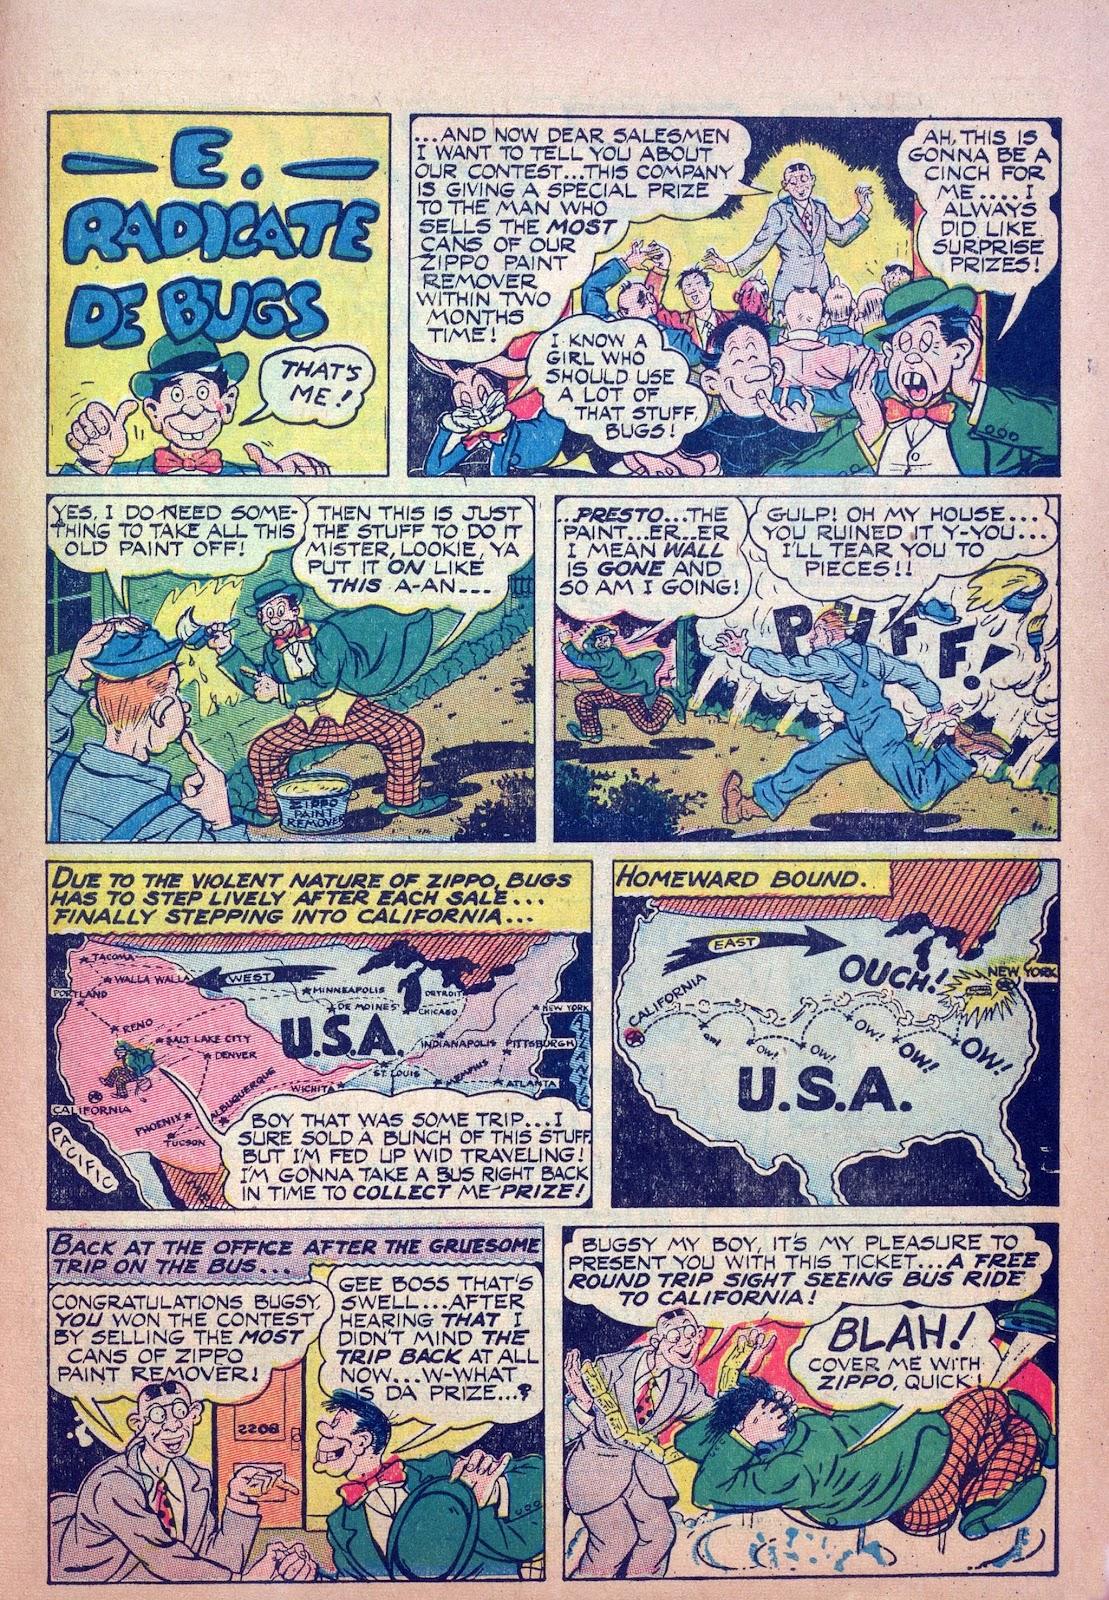 Read online Joker Comics comic -  Issue #14 - 47